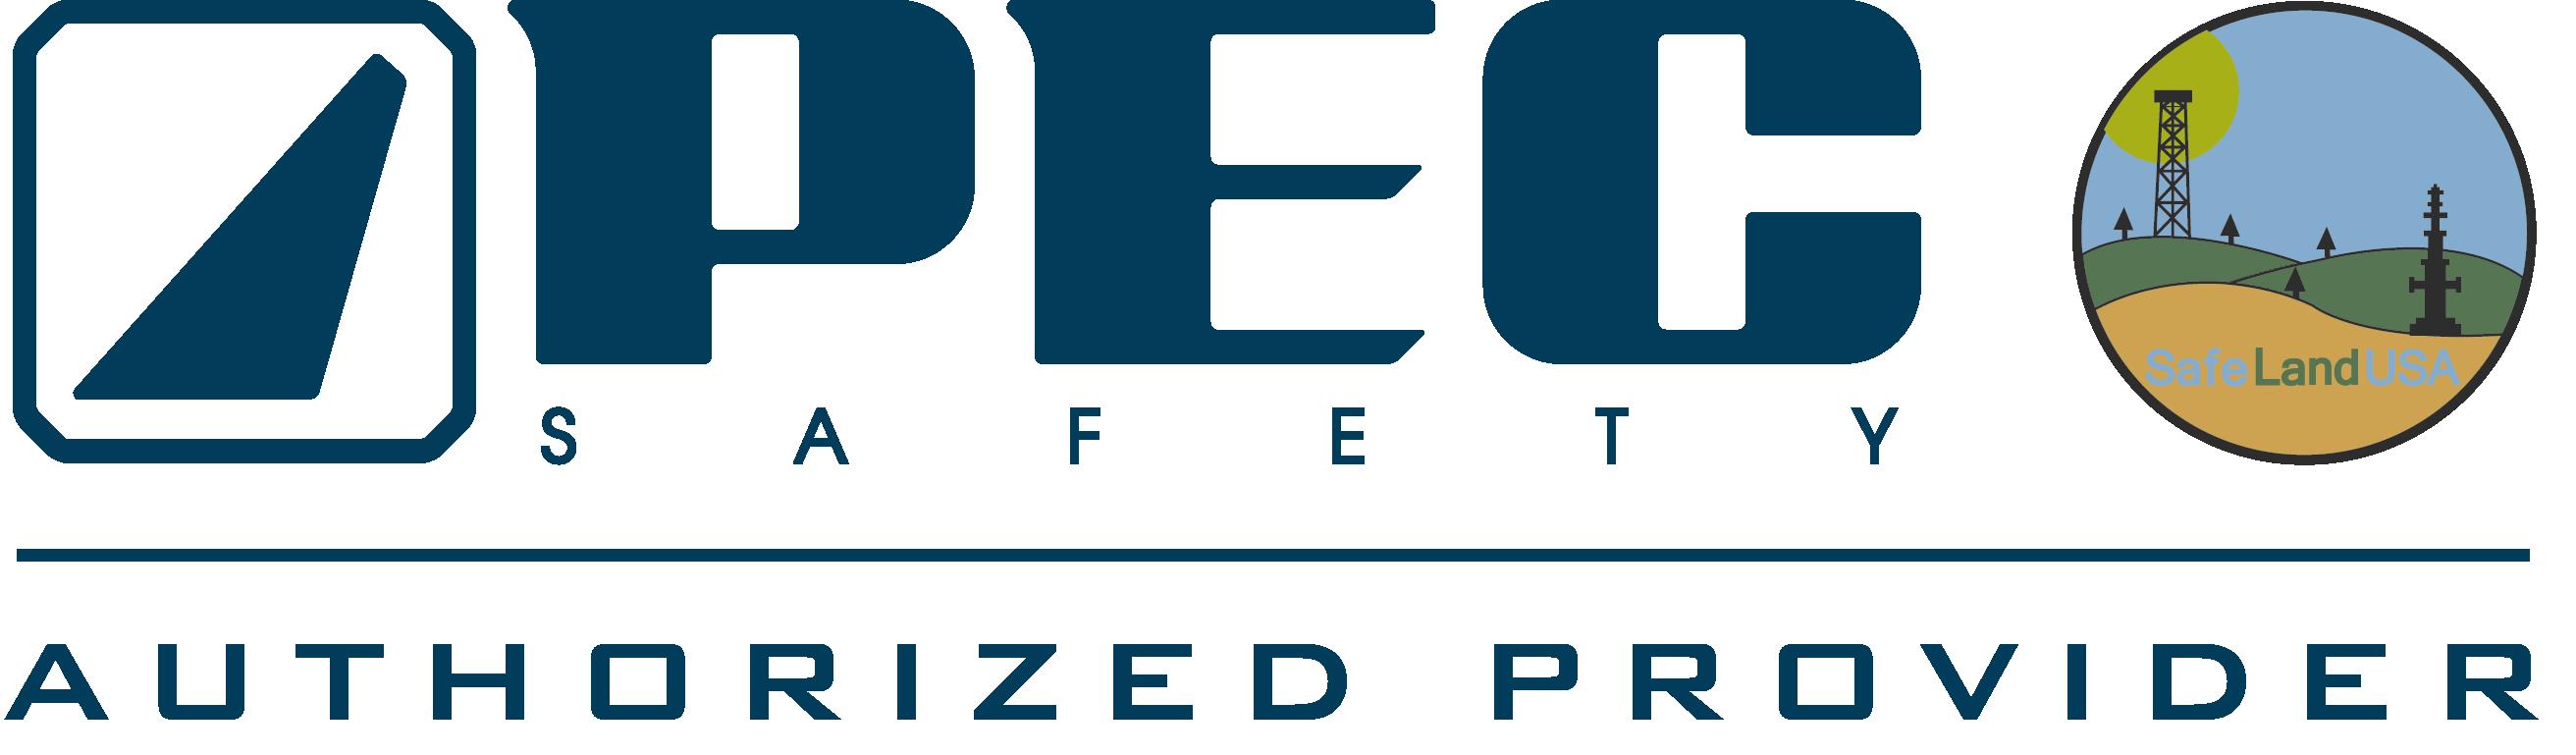 pecsafelandusaauthorizedprovider